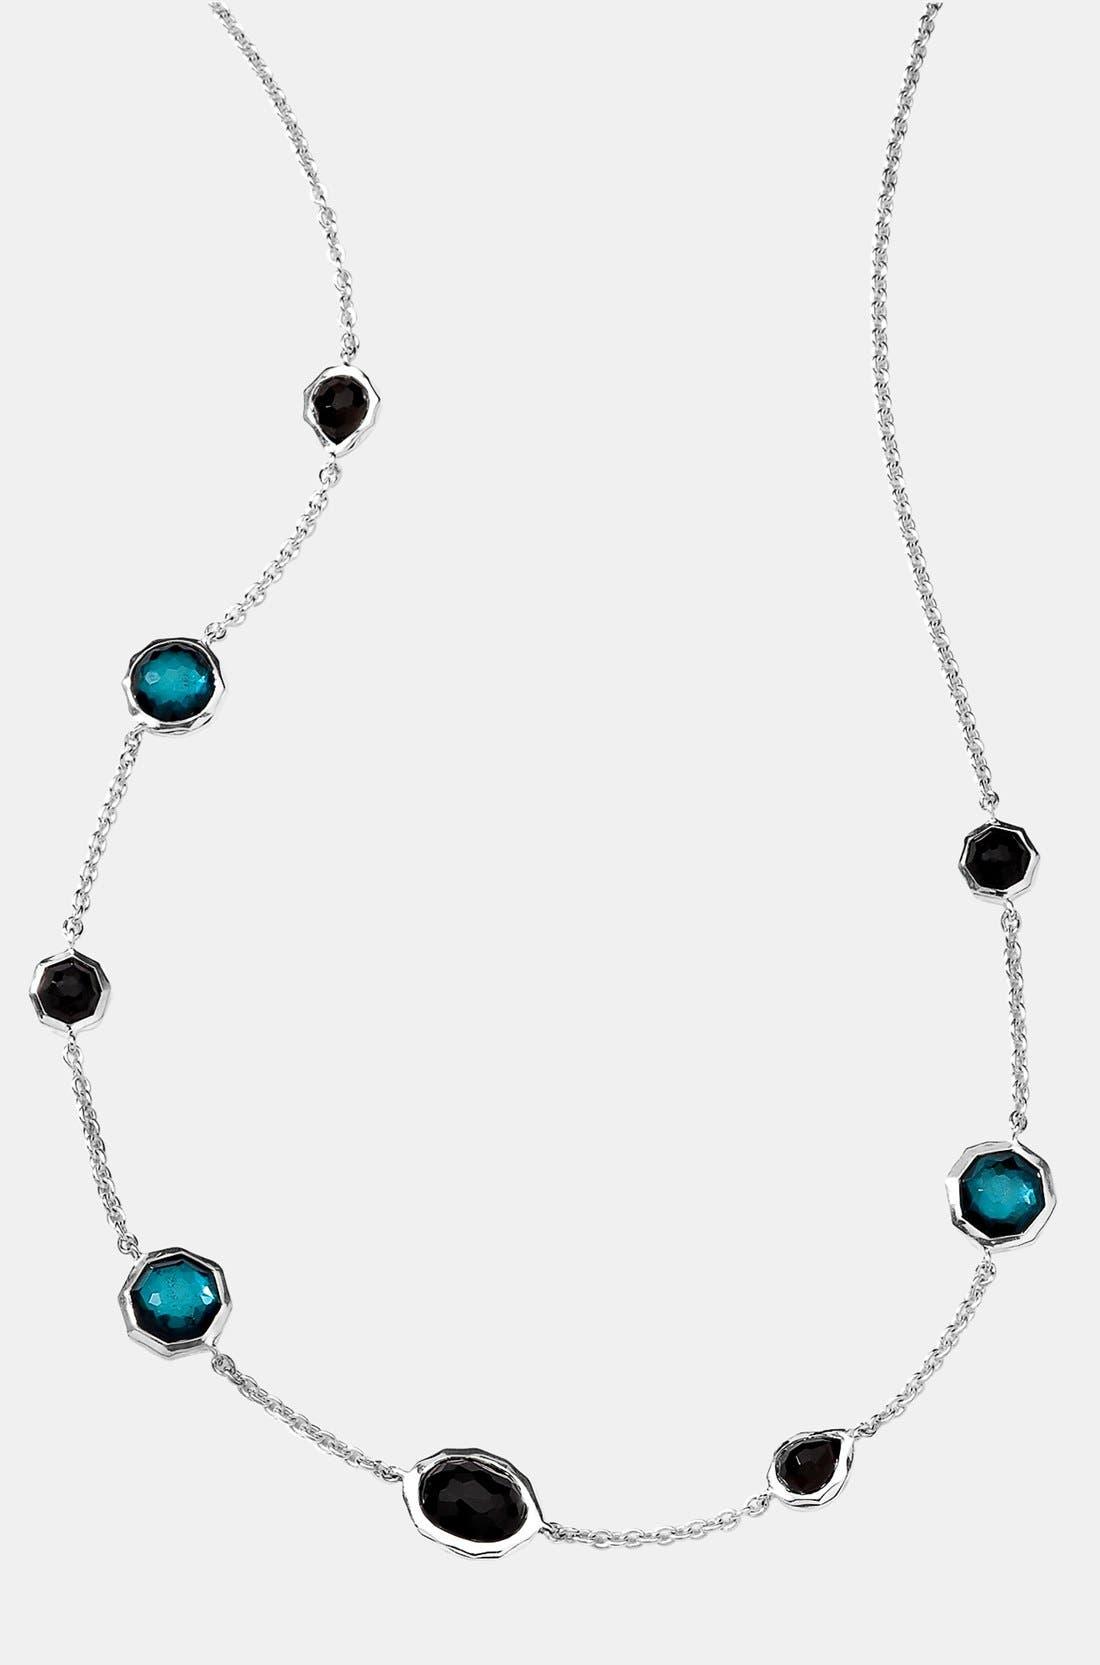 Main Image - Ippolita Stone & Chain Necklace